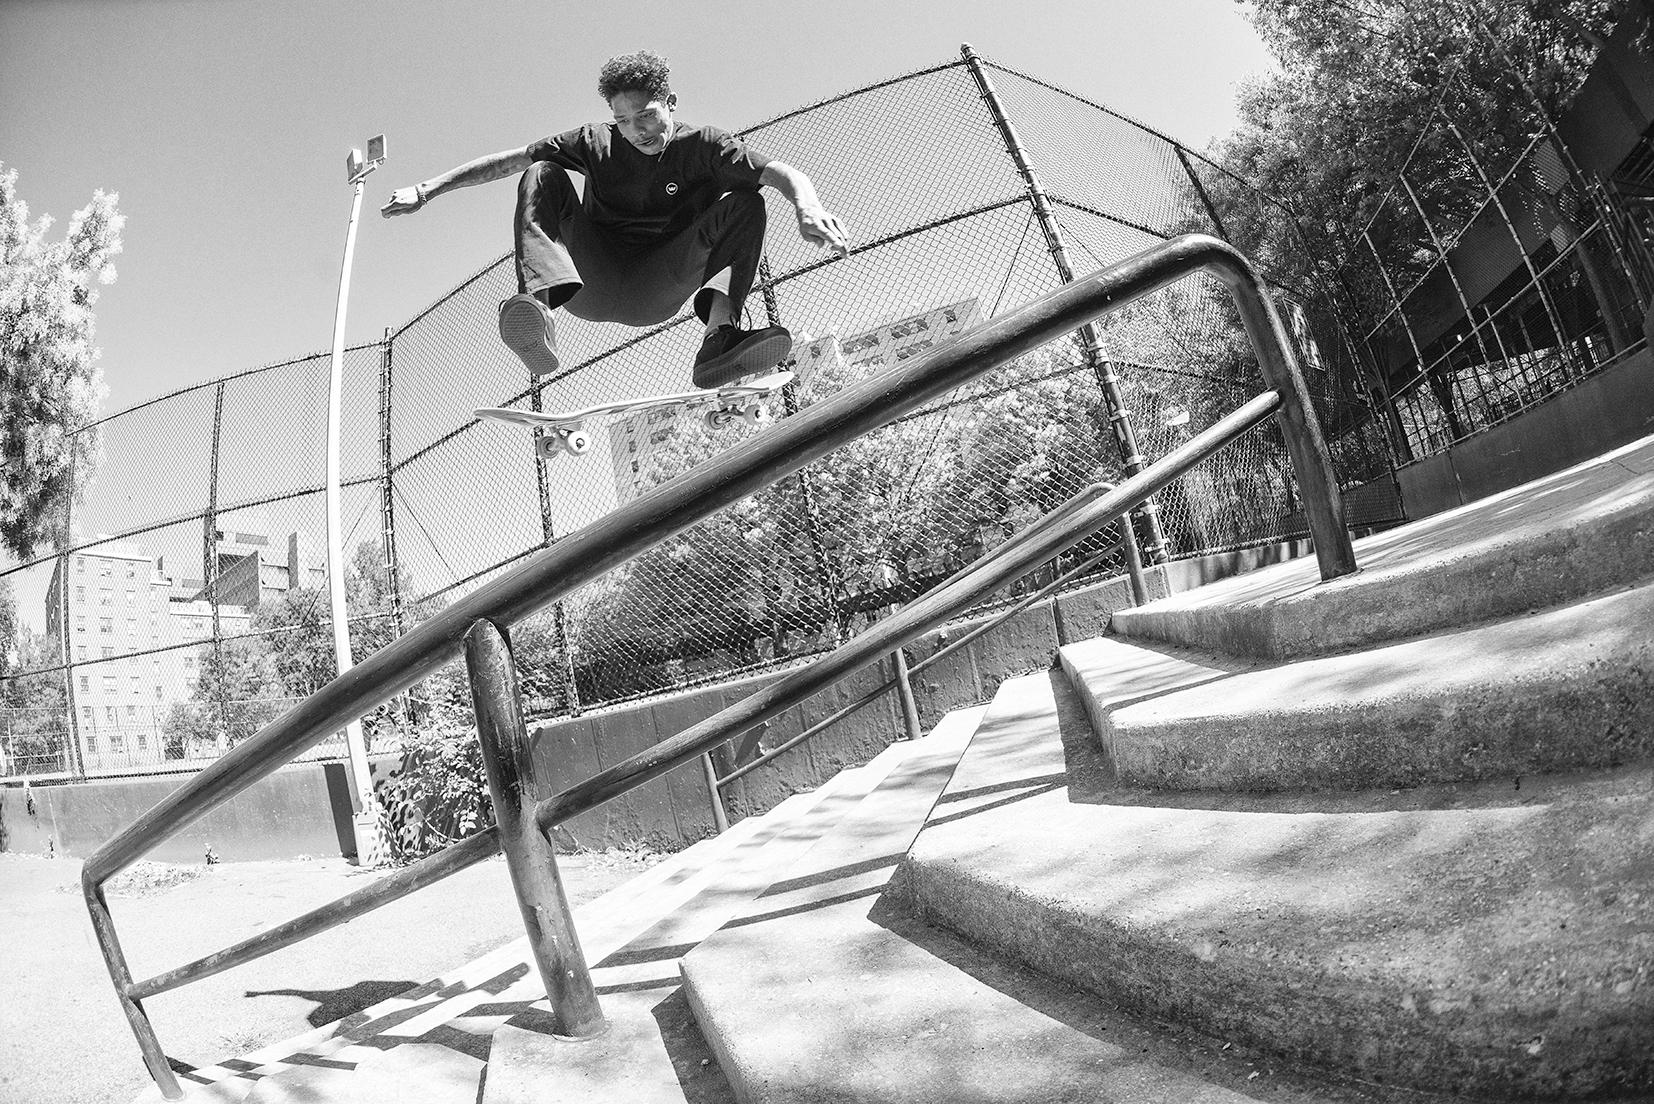 Boo Johnson | Kickflip Frontboard